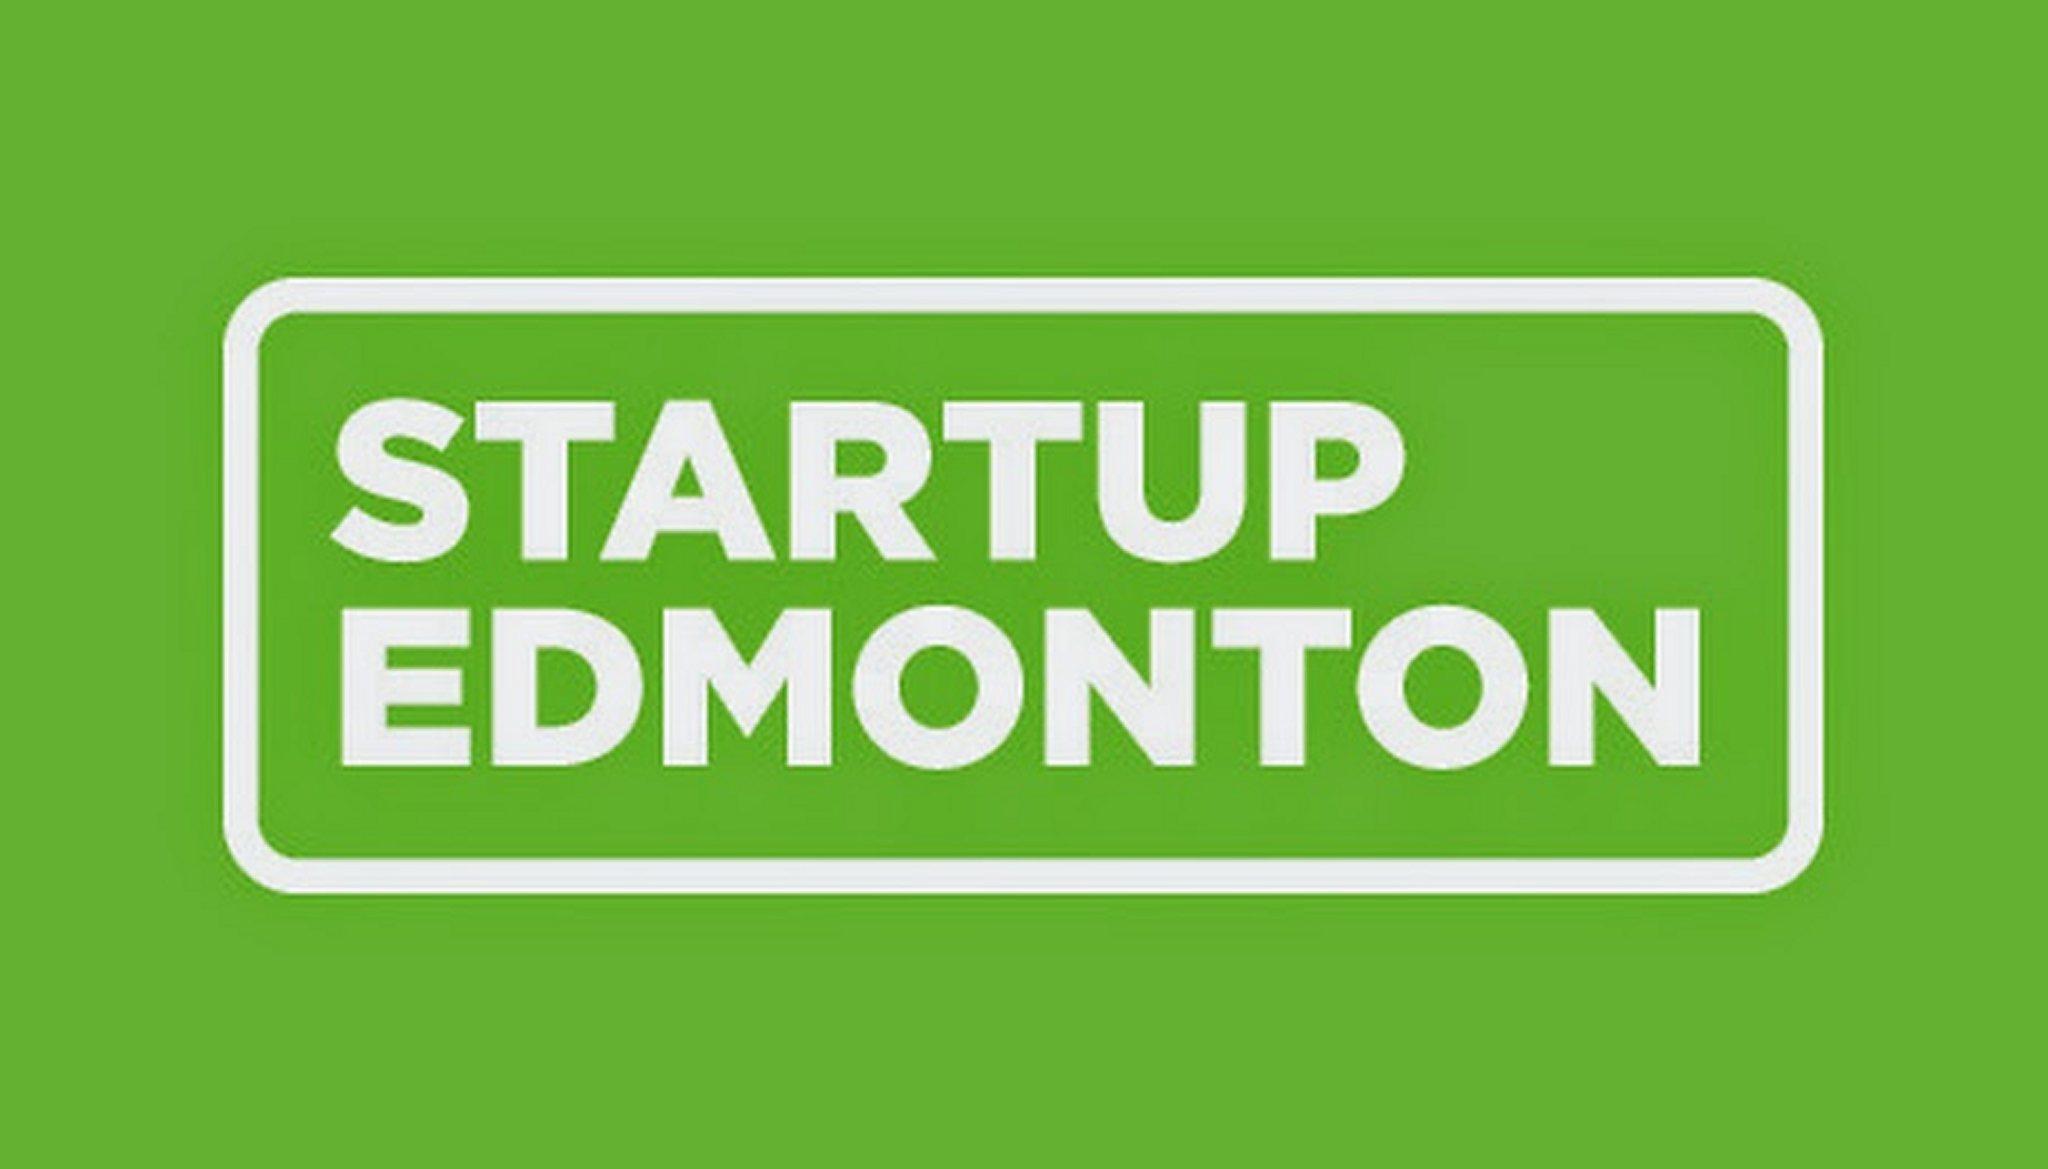 Ep 11: Building the Edmonton Startup Community with Tiffany Linke